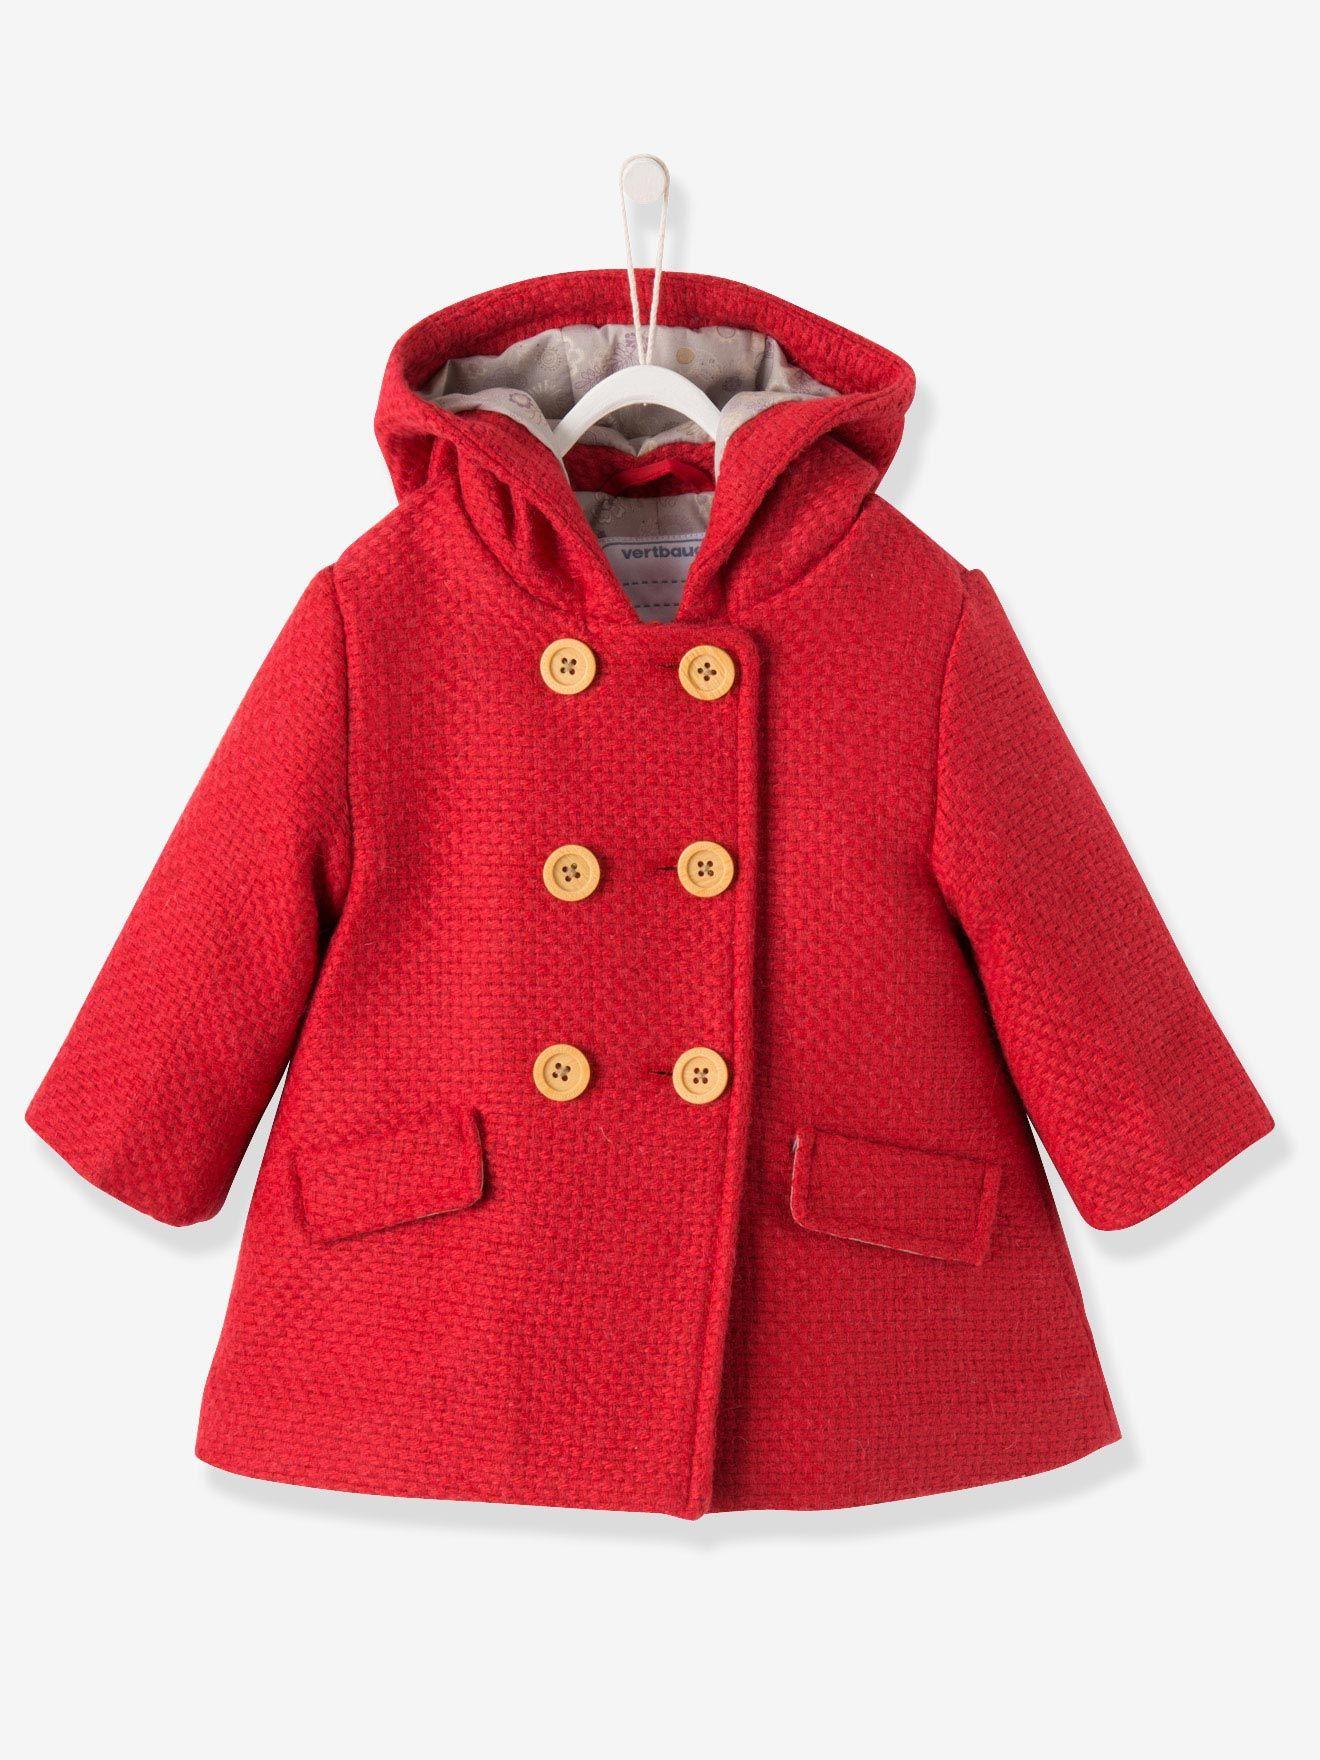 Vert Baudet Fille Frais Photographie Vertbaudet Baby Mantel Mit Kapuze Wollmix In Rot